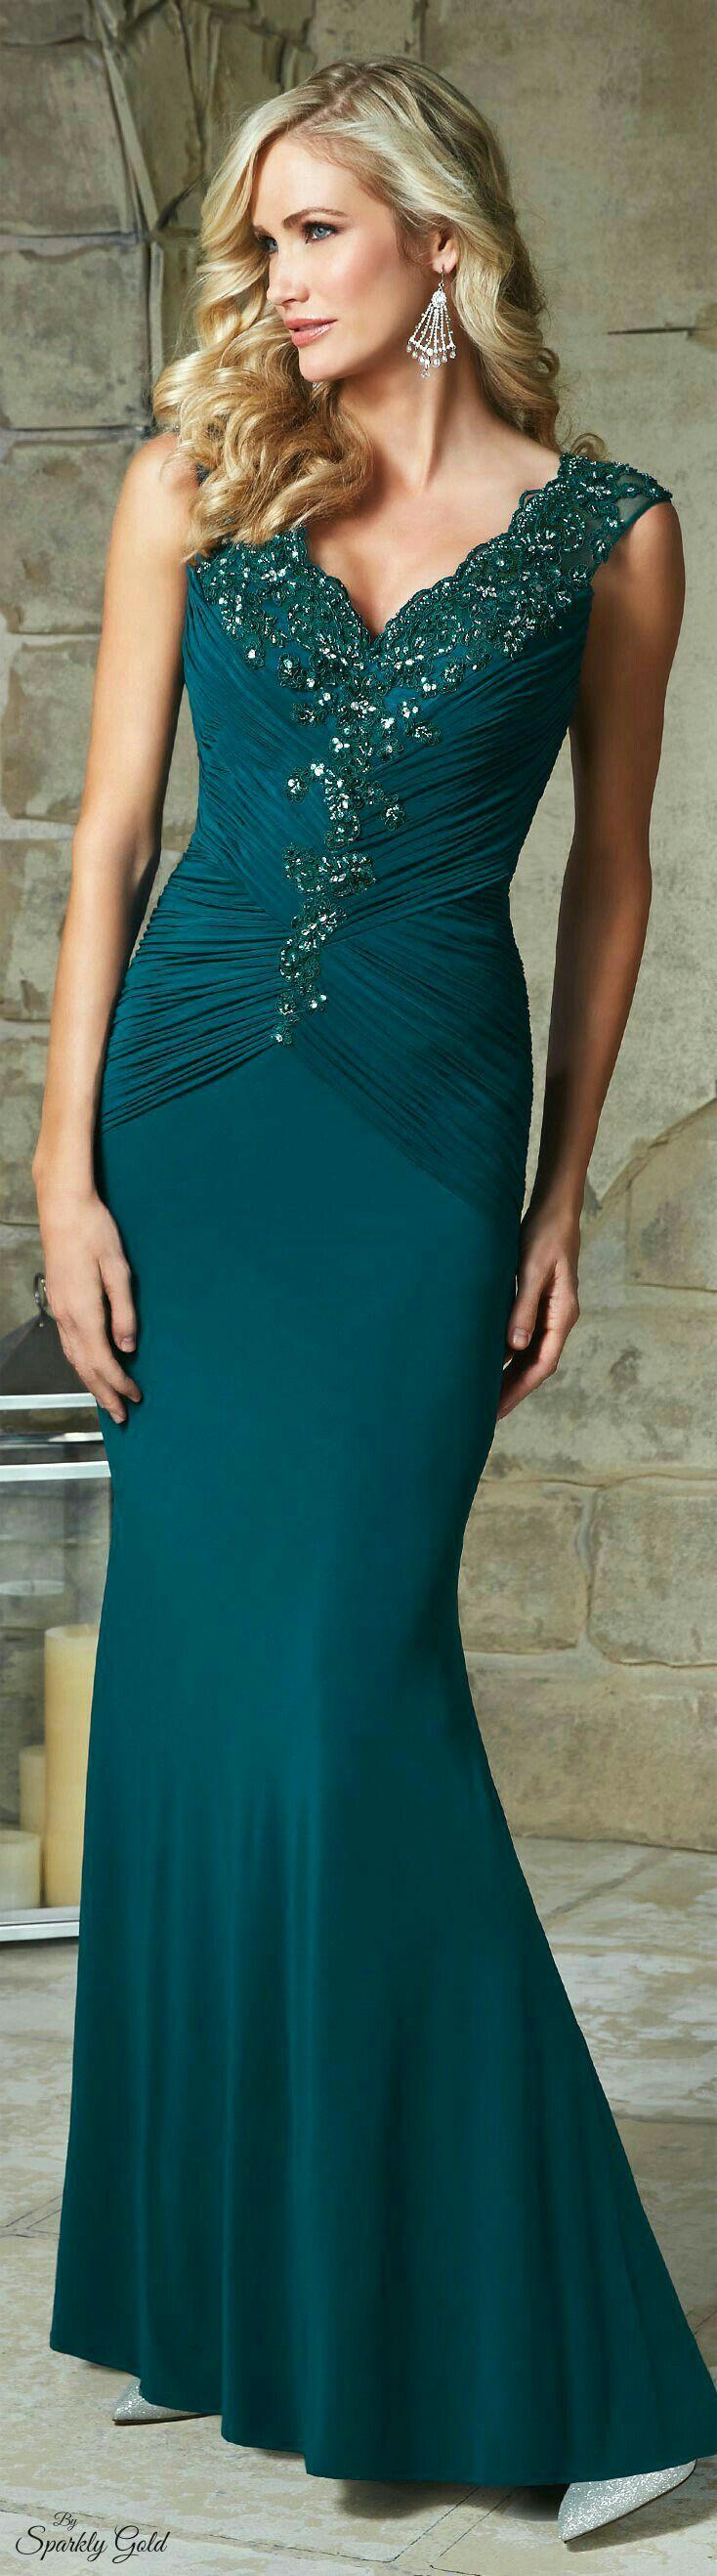 37 best Plus size evening wear, gowns images on Pinterest   Big ...